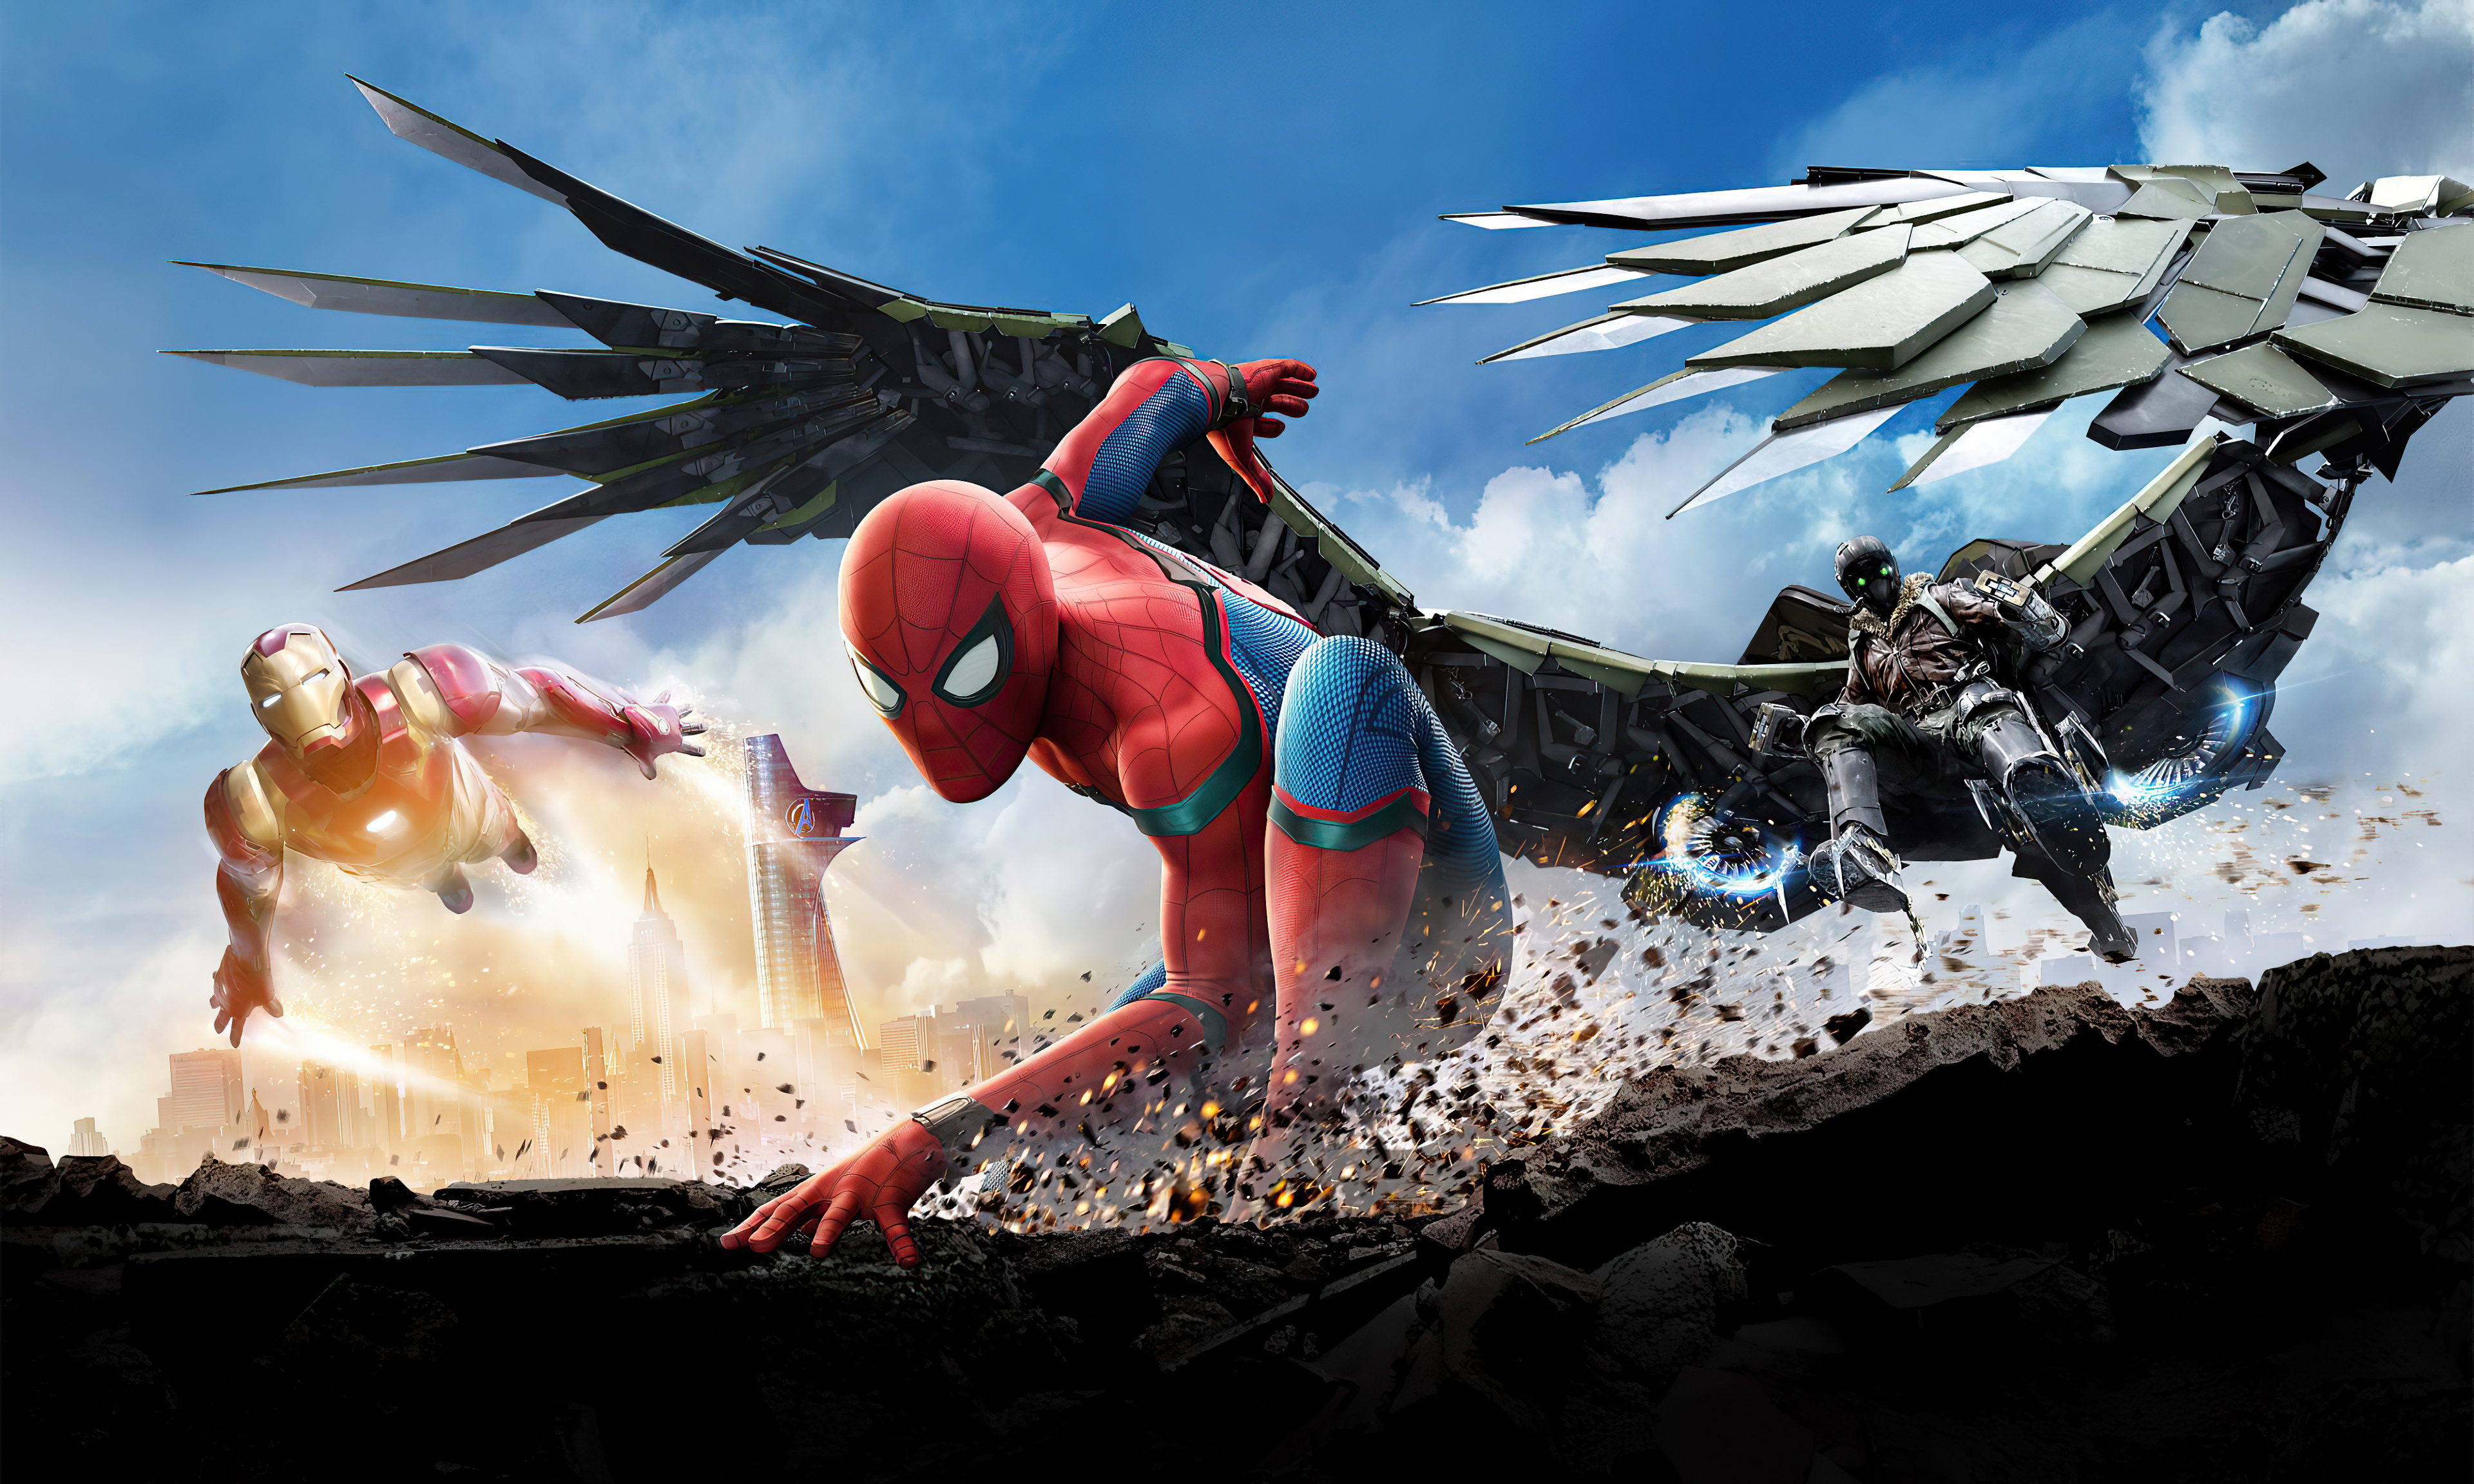 spider man homecoming 2020 4k 1602435729 - Spider Man Homecoming 2020 4k - Spider Man Homecoming 2020 4k wallpapers